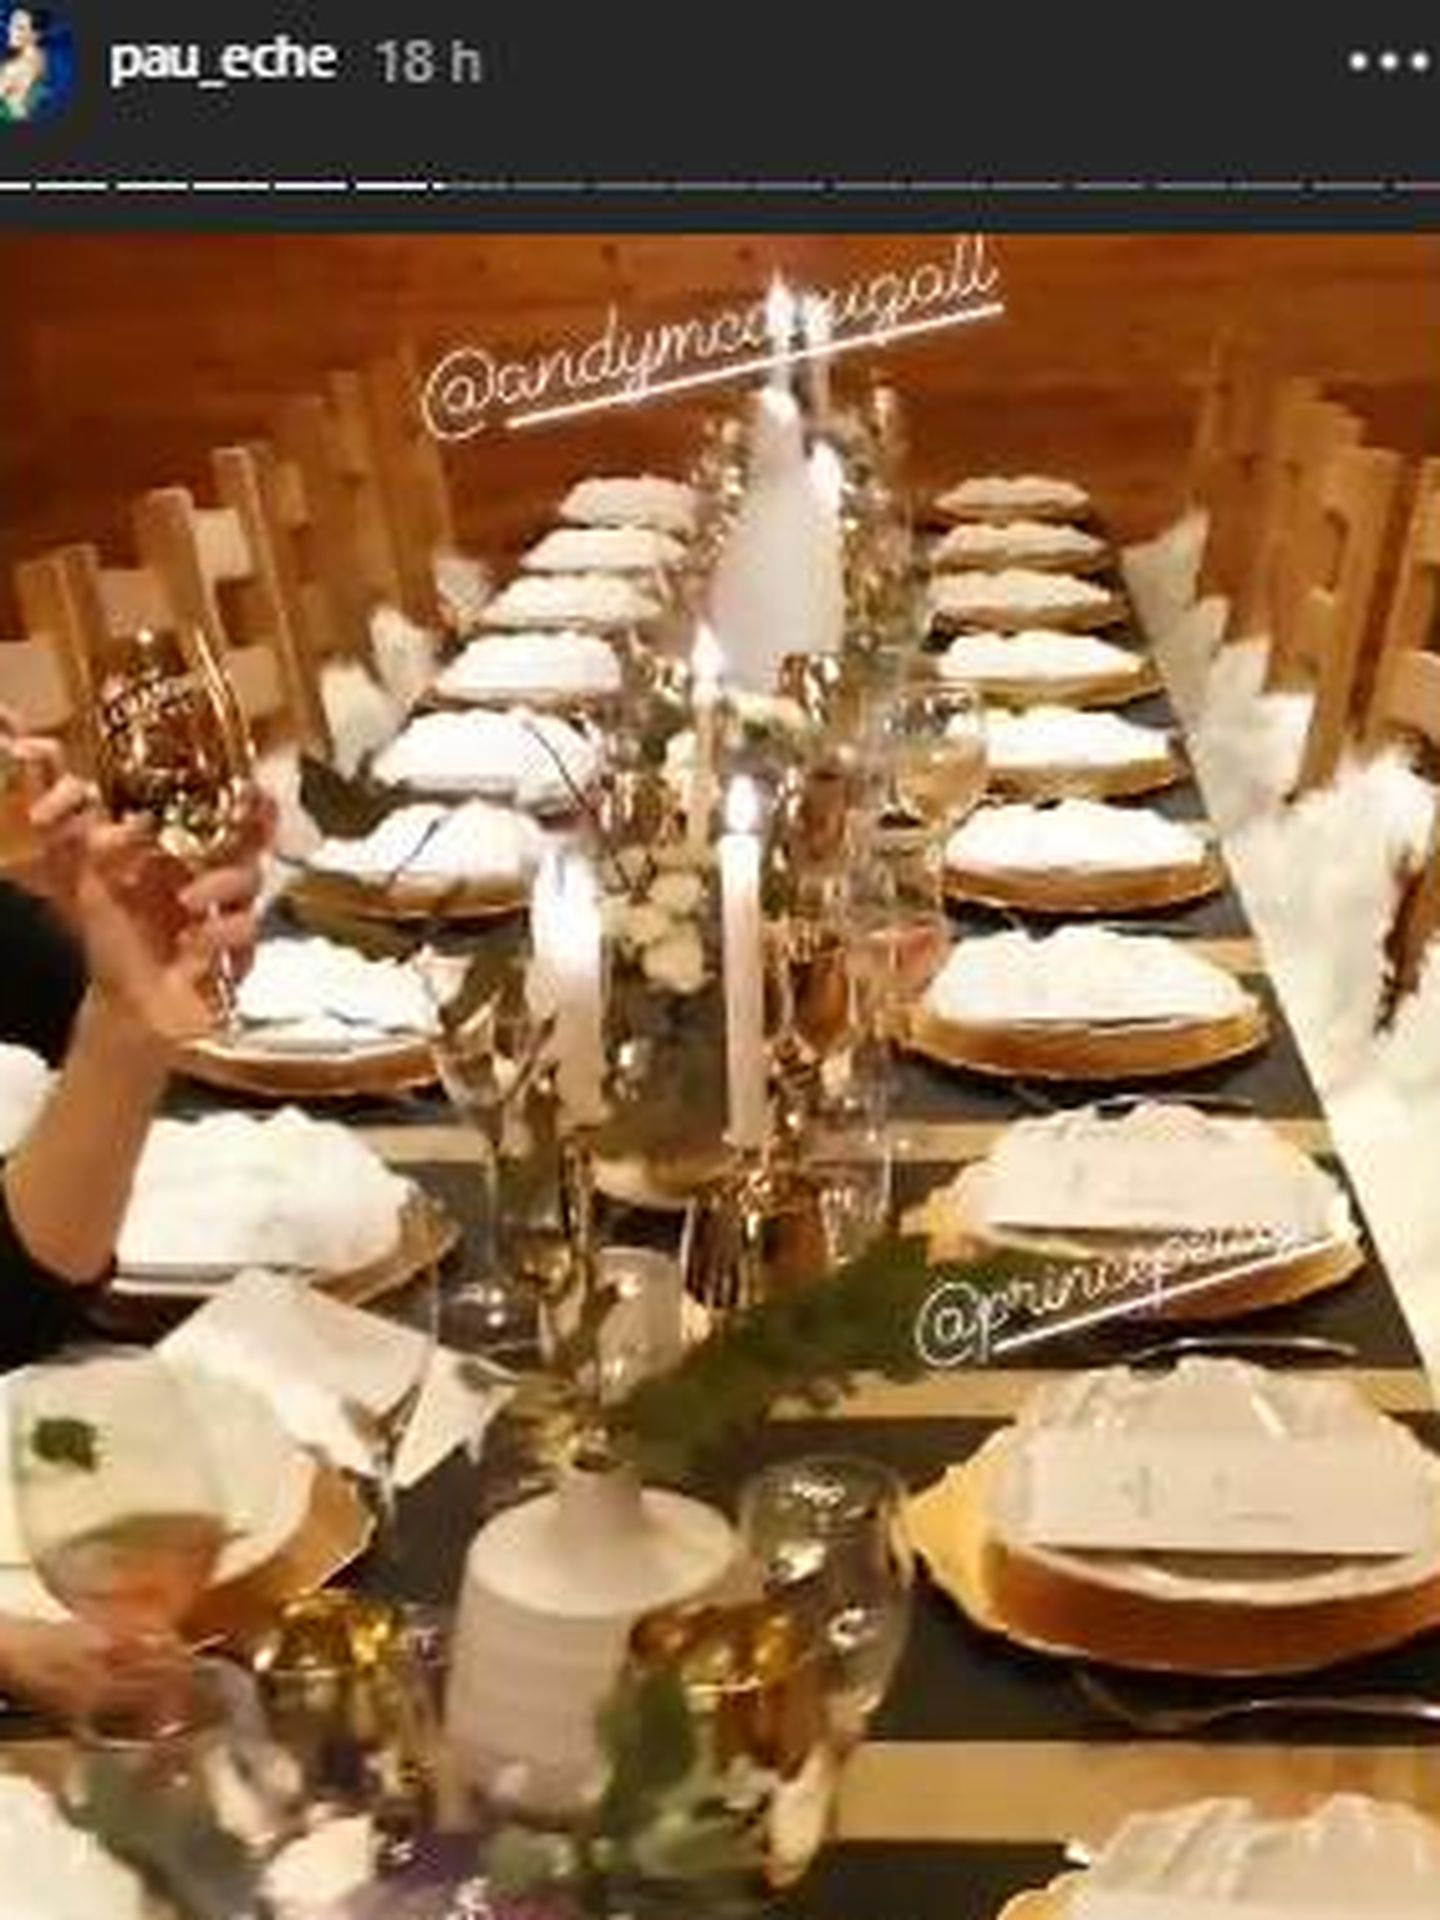 La cena de la que han disfrutado en Baqueira Beret. (IG)